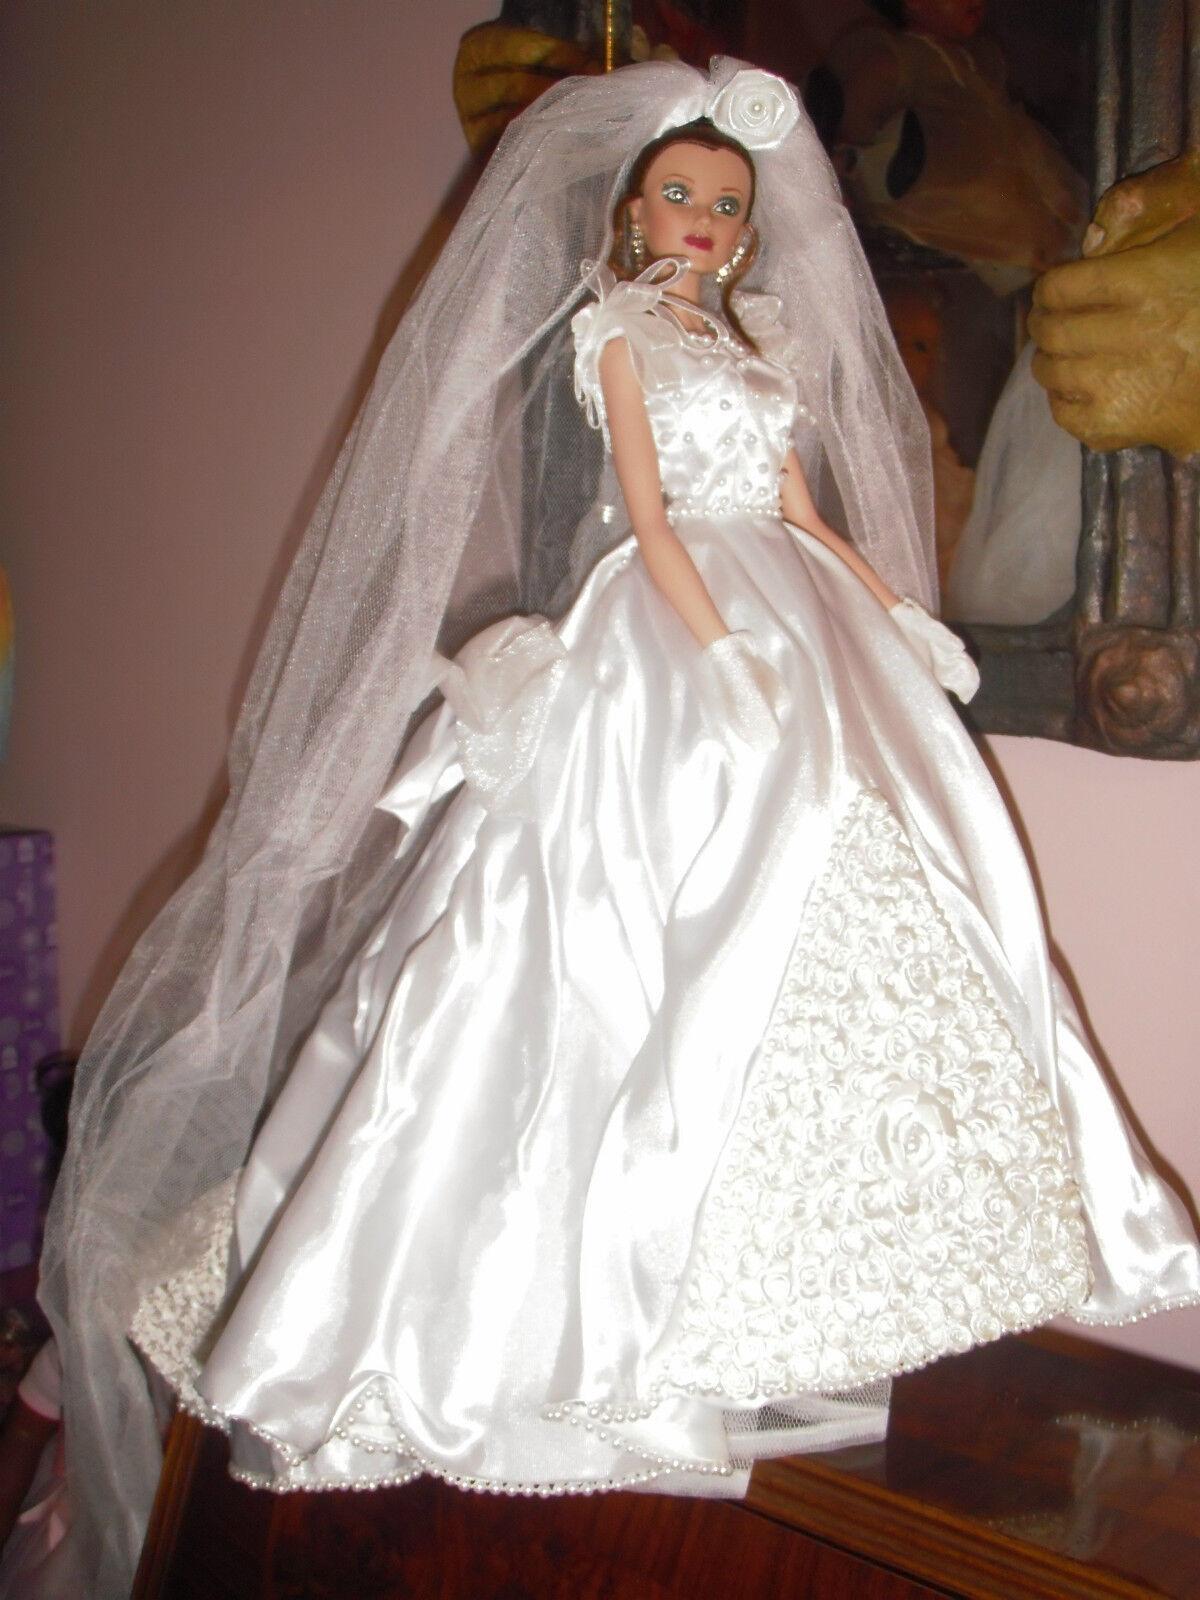 MUÑECA MANIQUÍ GIGI BRIDE,THE BUTTERFLY RING, de Sandra Bilotto, ed. lim y num.